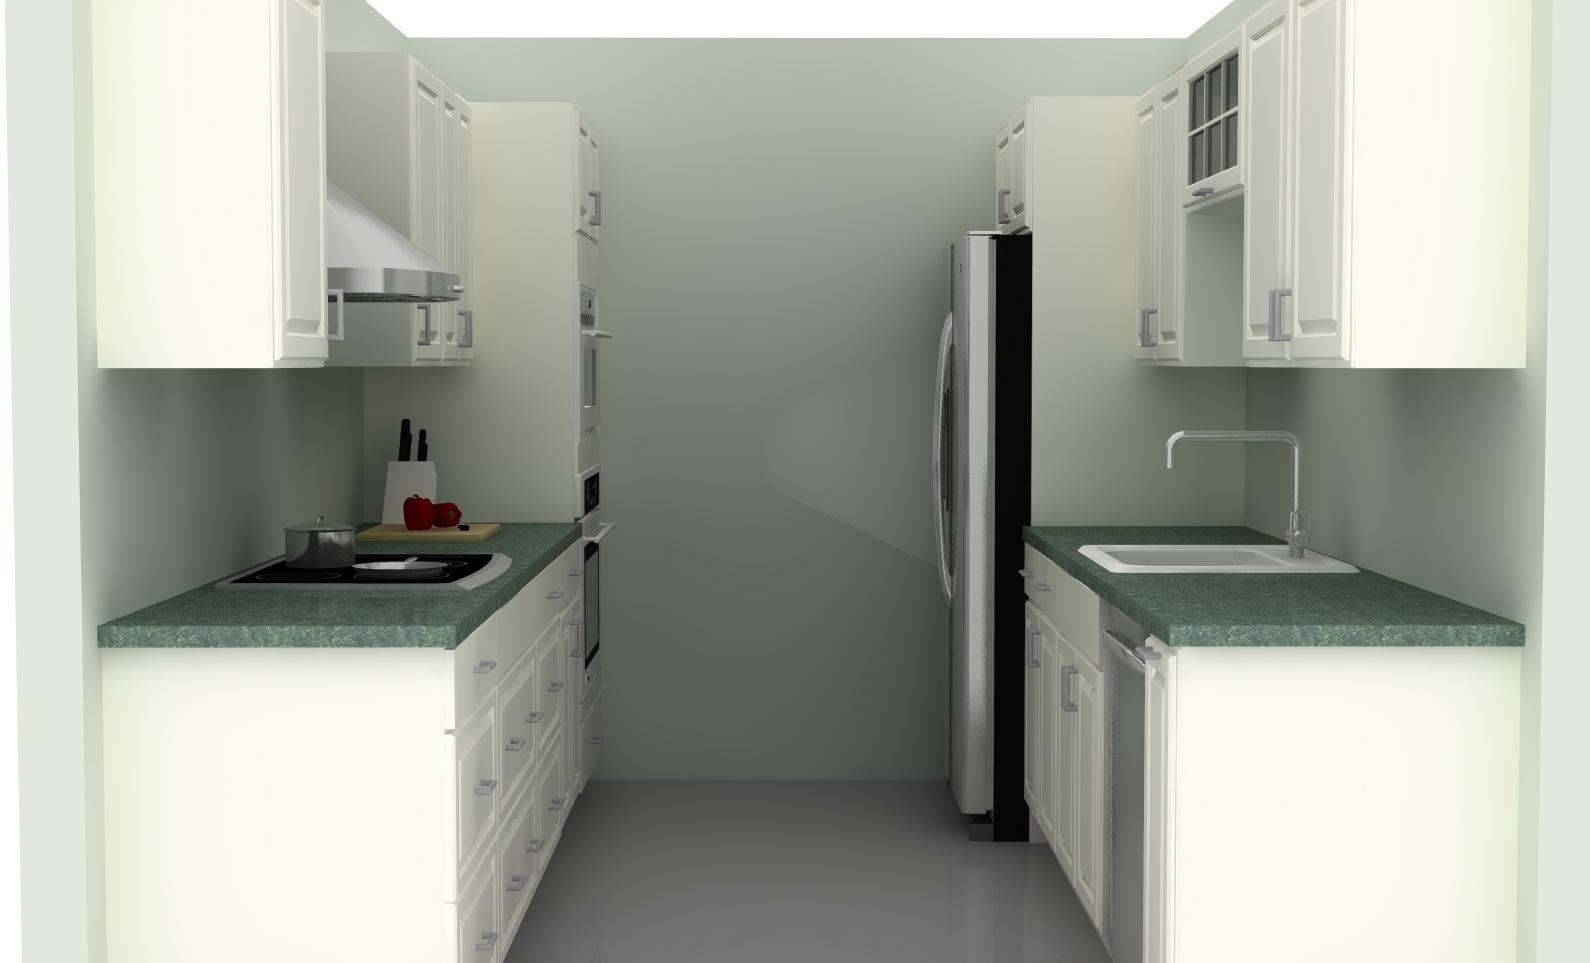 Fullsize Of Design New Kitchen Layout